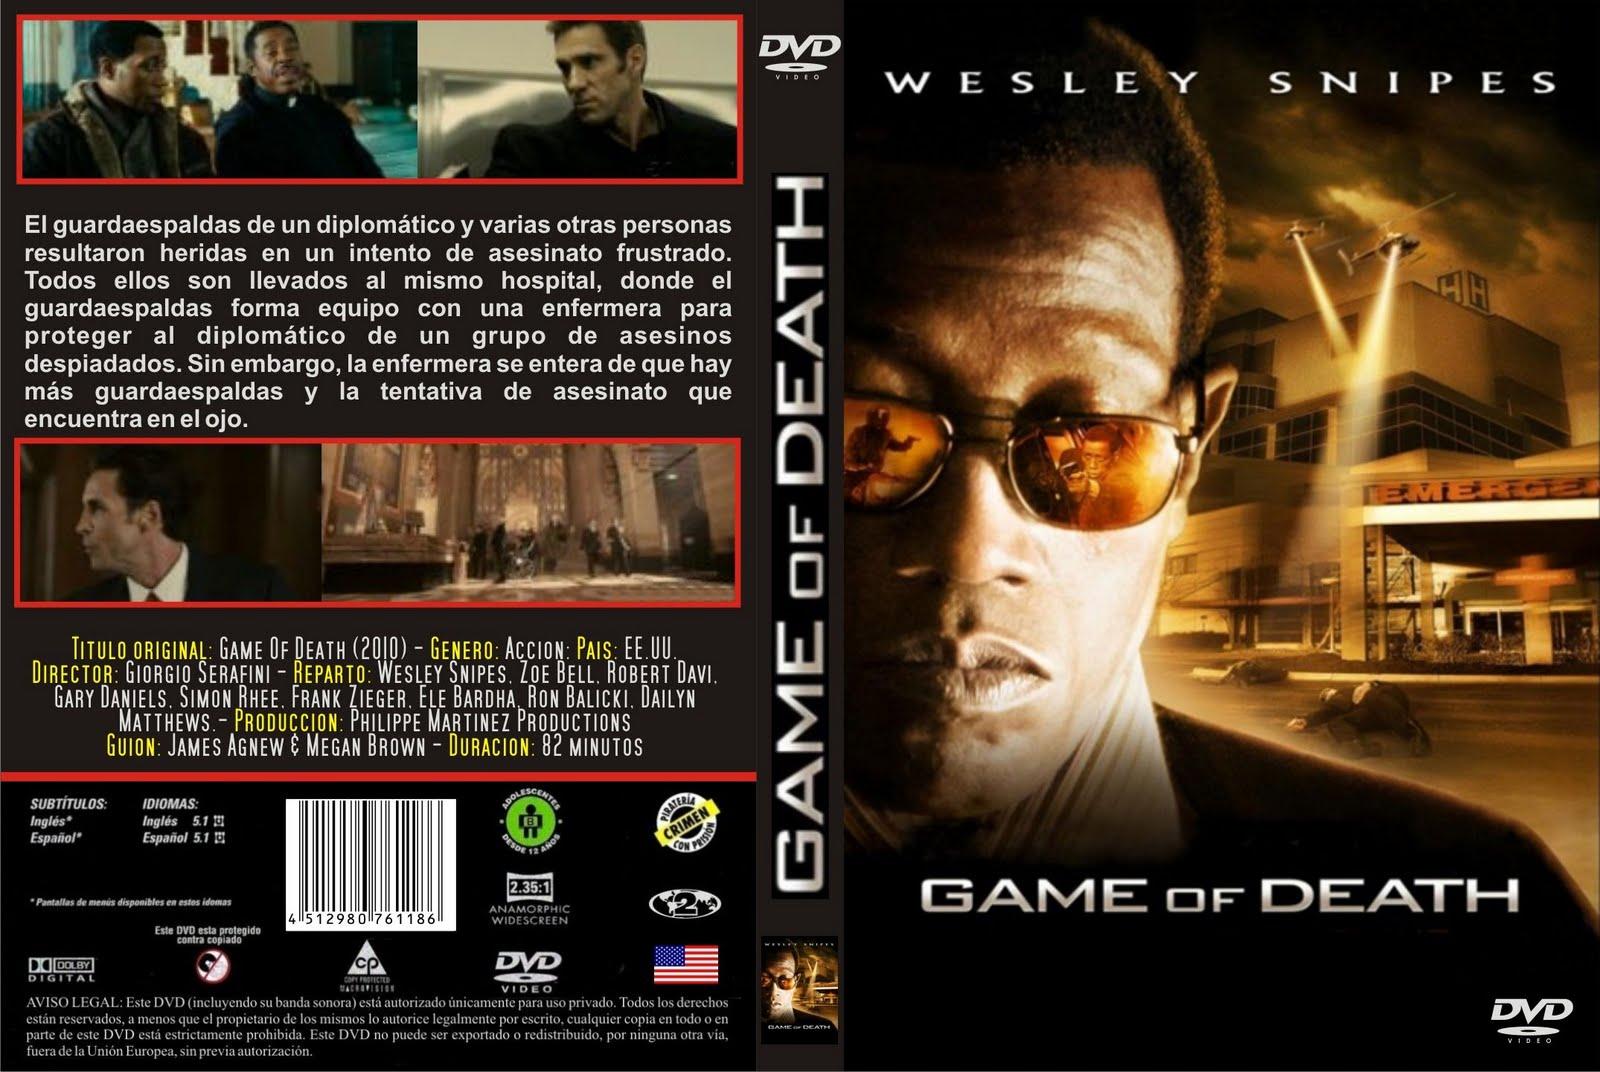 http://4.bp.blogspot.com/_R8FMZIDmtTY/TSsE6R5F2dI/AAAAAAAADFg/PP_VJEB36ew/s1600/Game_Of_Death_-_2010_-_Custom_por_jonander1_%255Bdvd%255D_80.jpg